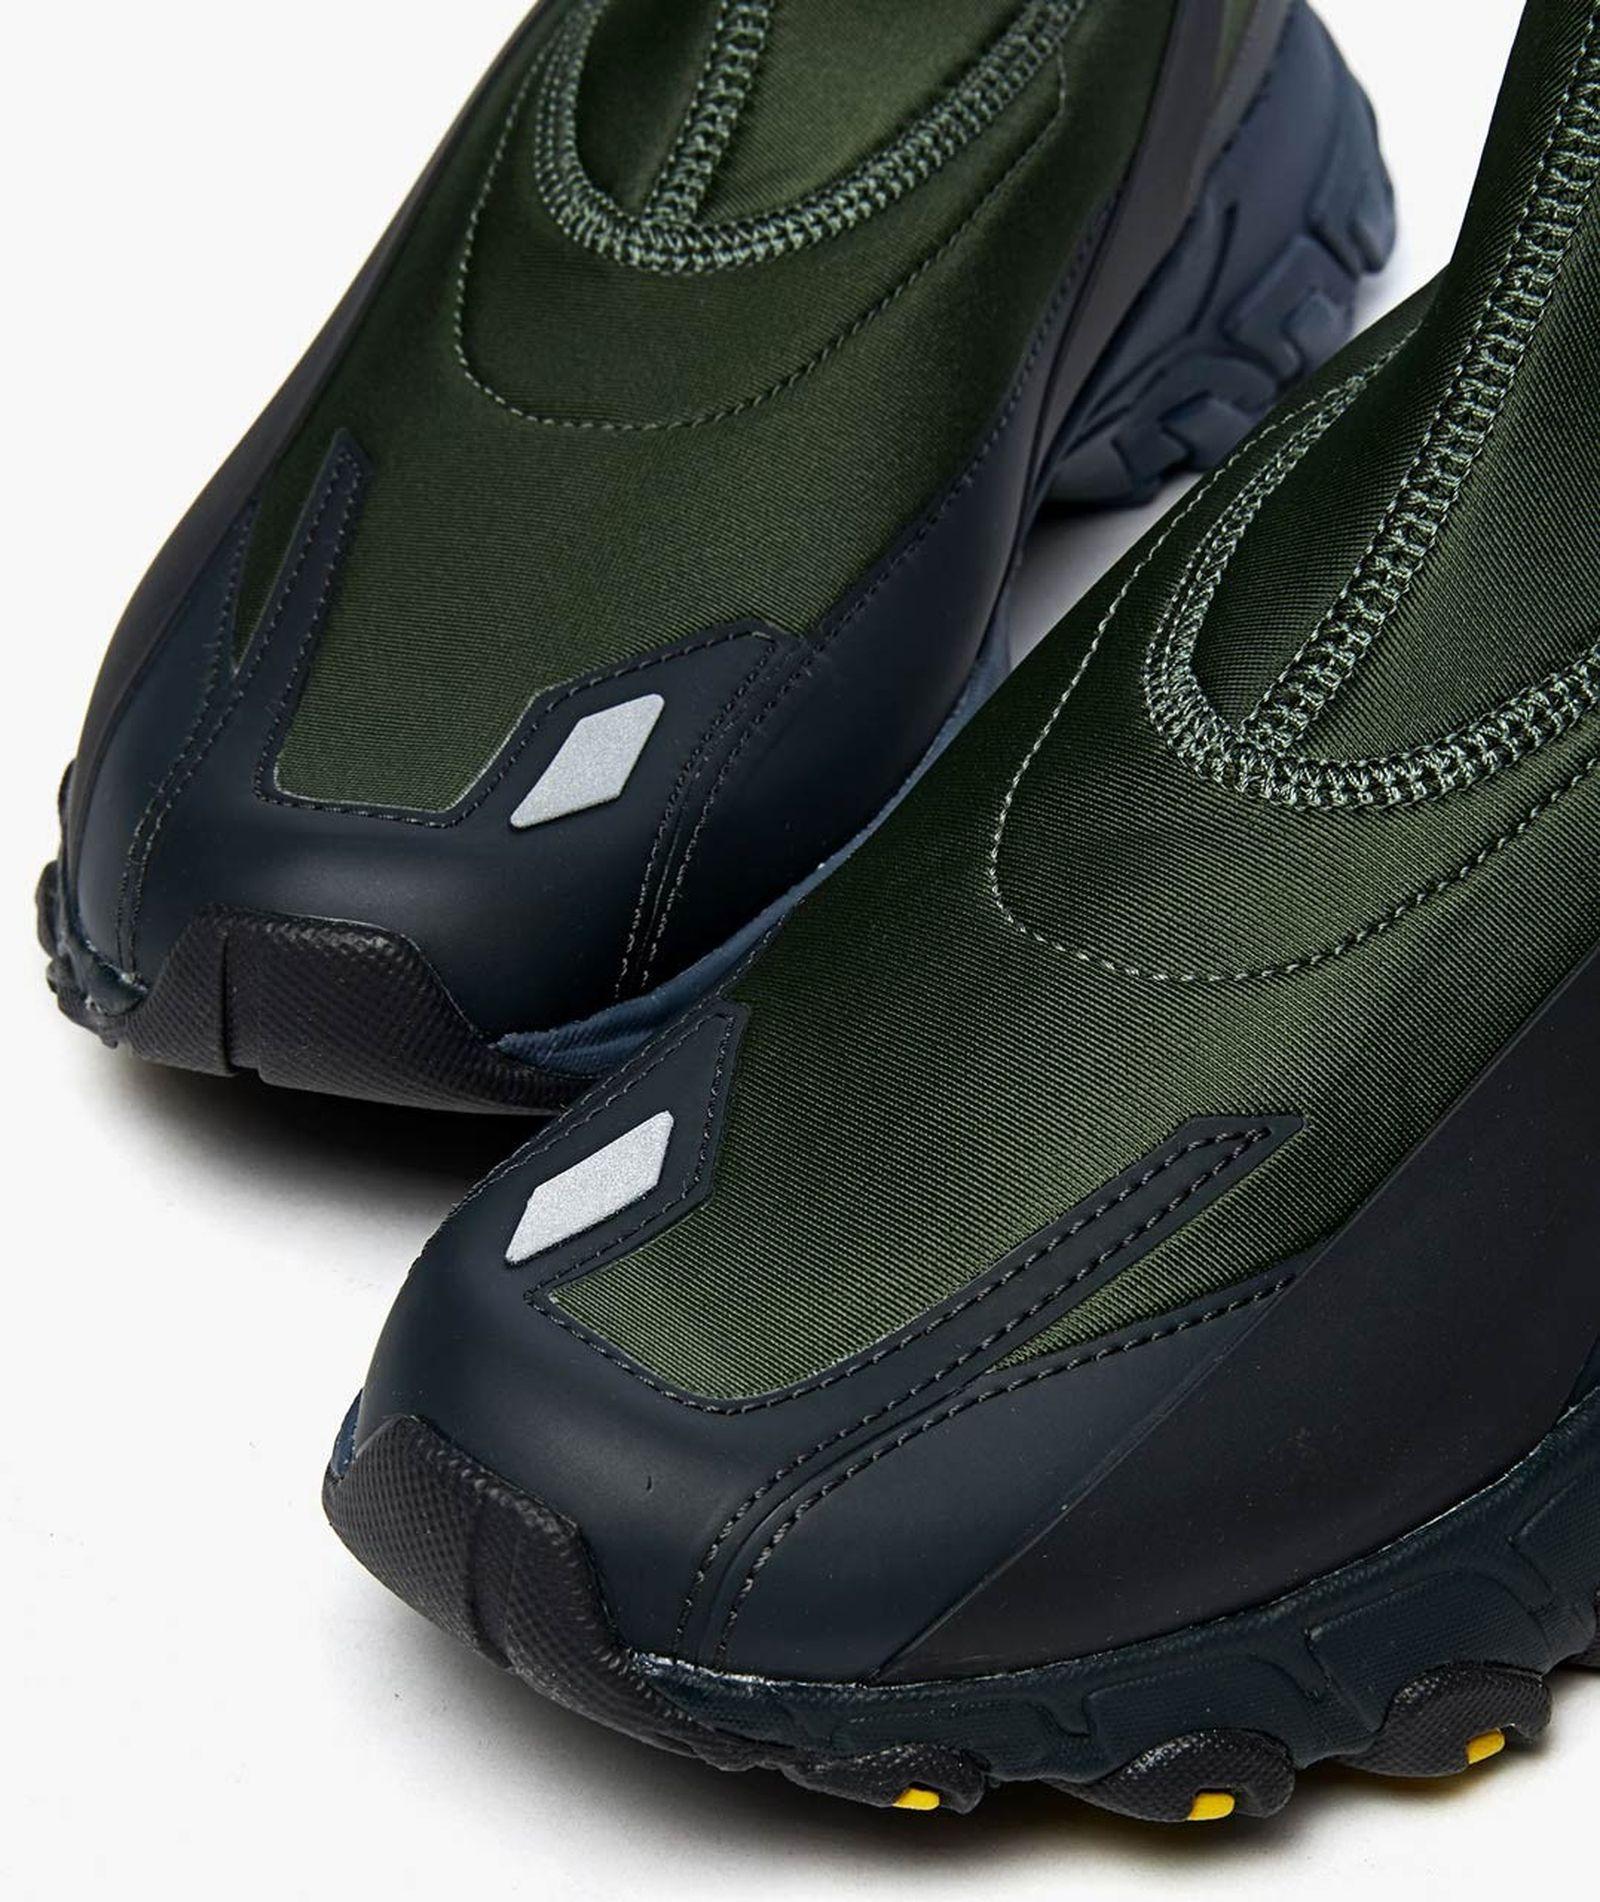 reebok-dmx-trail-hydrex-primal-green-release-date-price-02